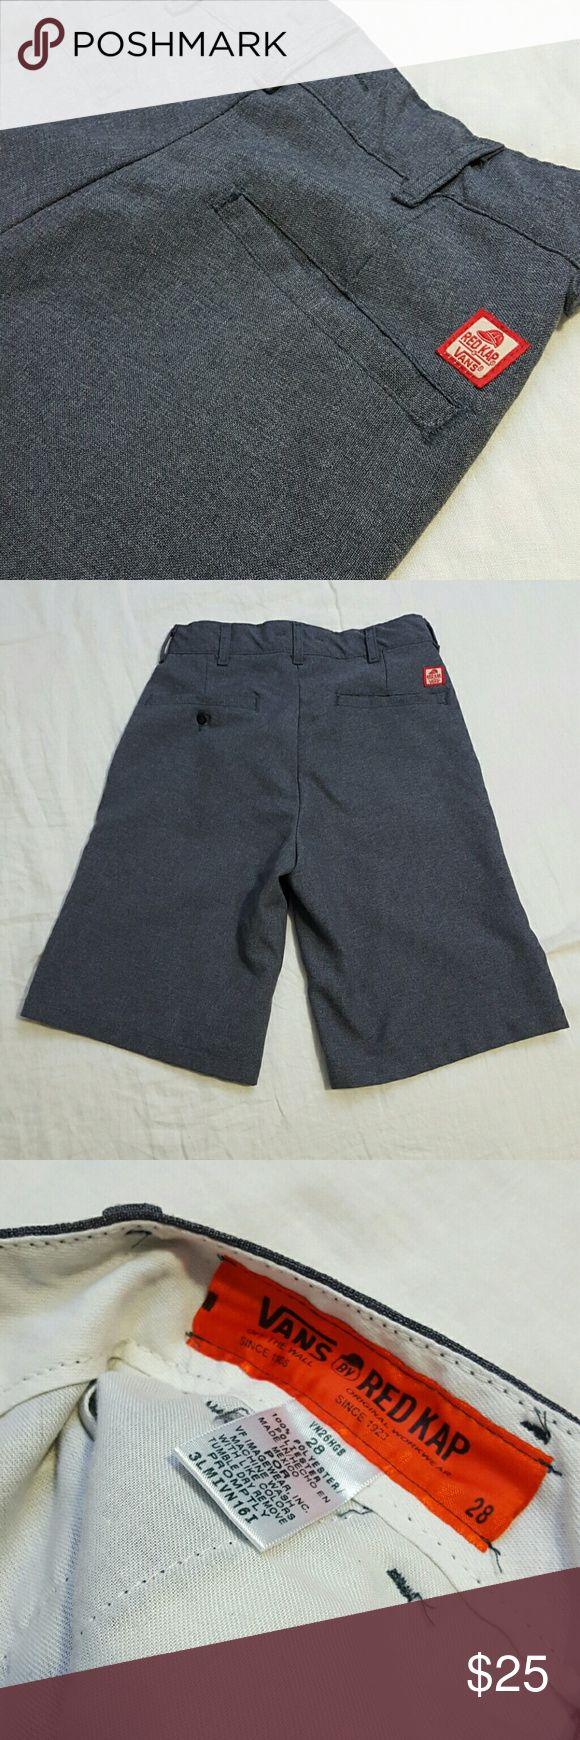 "Vans x Red Kap Grey Lightweight Workwear Shorts Vans x Red Kap Grey Workwear Shorts Size: 28  Measurements: Waist: 14"" Inseam:  10.5"" Outseam:  21 1/4""  Great Condition Vans Shorts Flat Front"